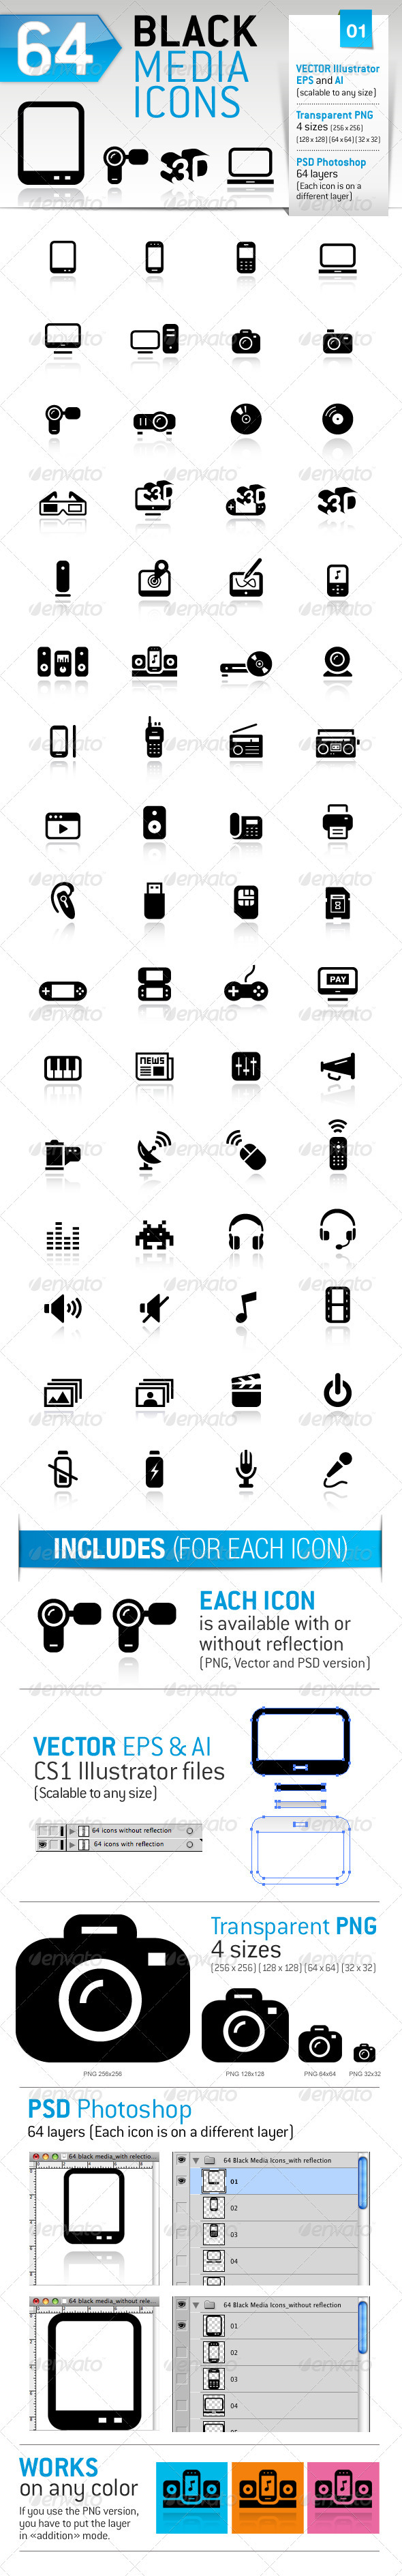 GraphicRiver 64 Black Media Icons 1322689